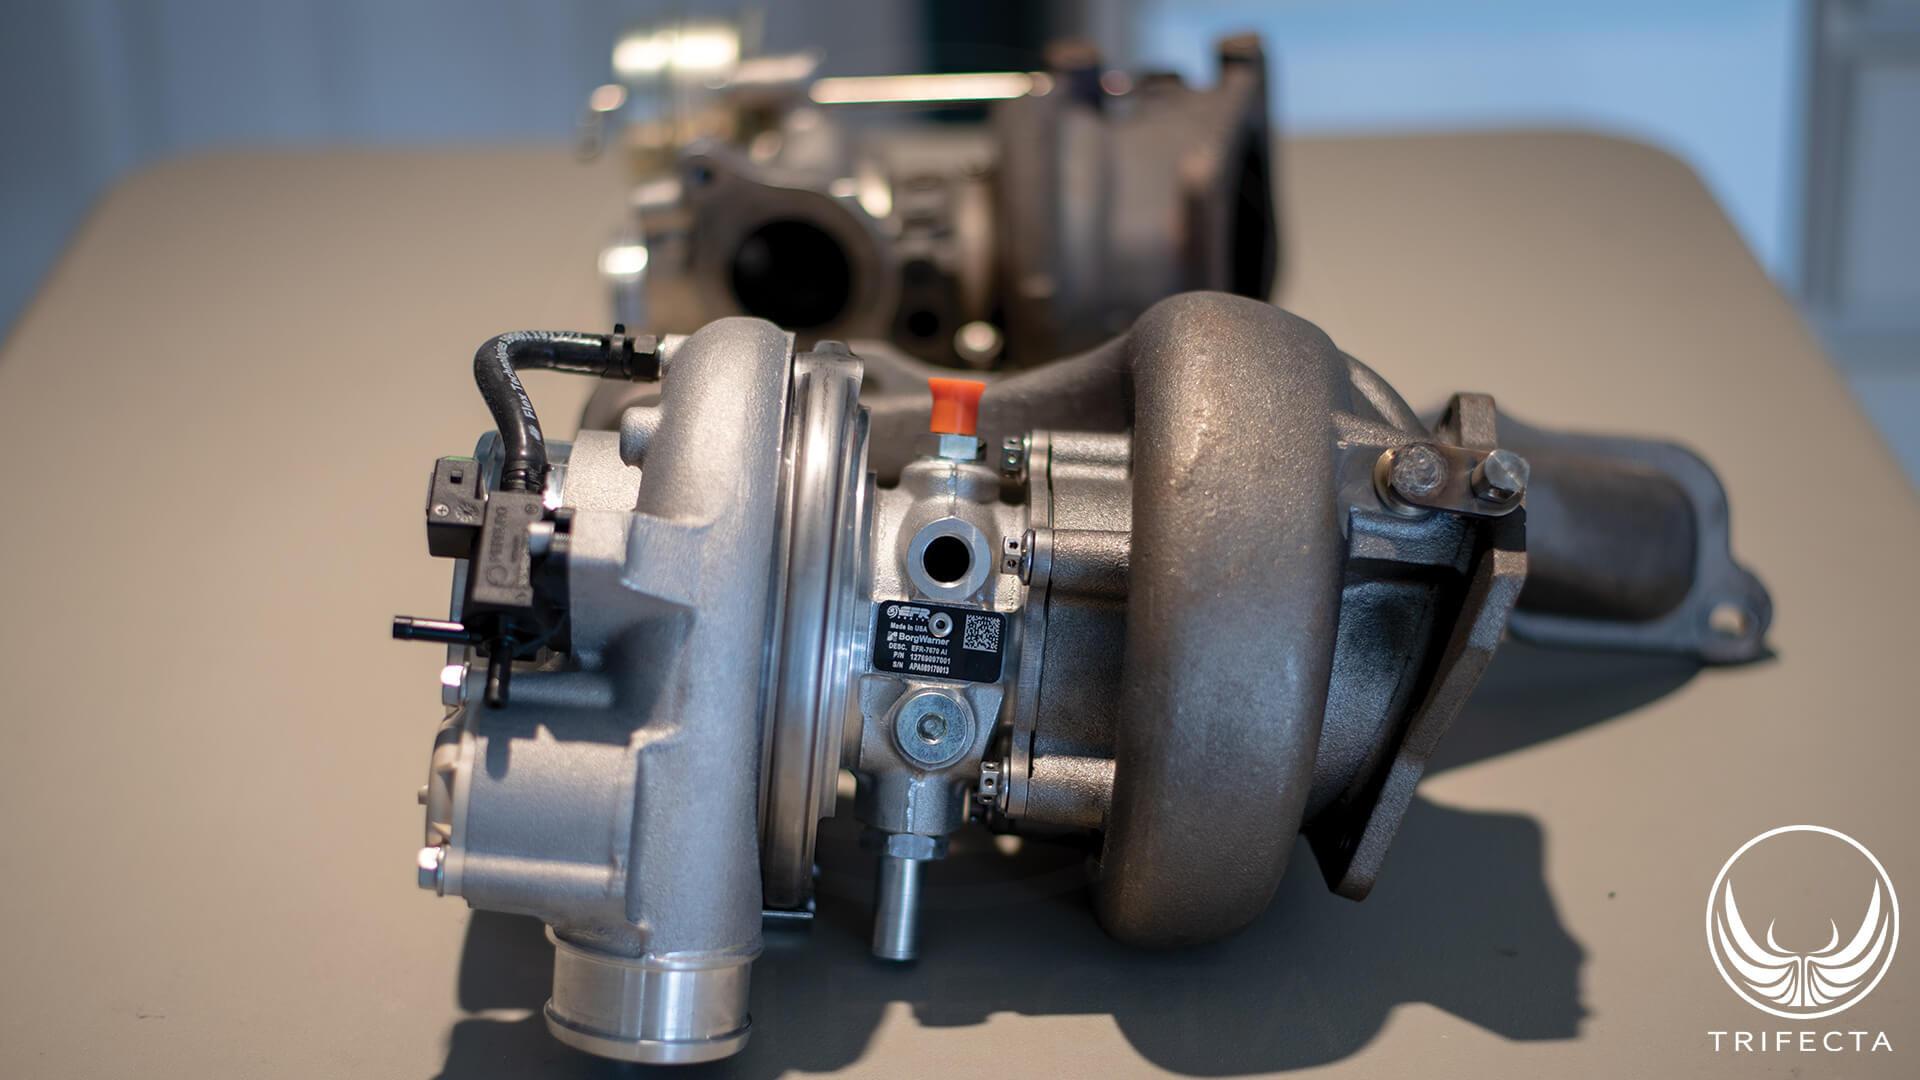 TRIFECTA: Big Turbo (EFR7670) + 2 0L LTG = 500WHP - News